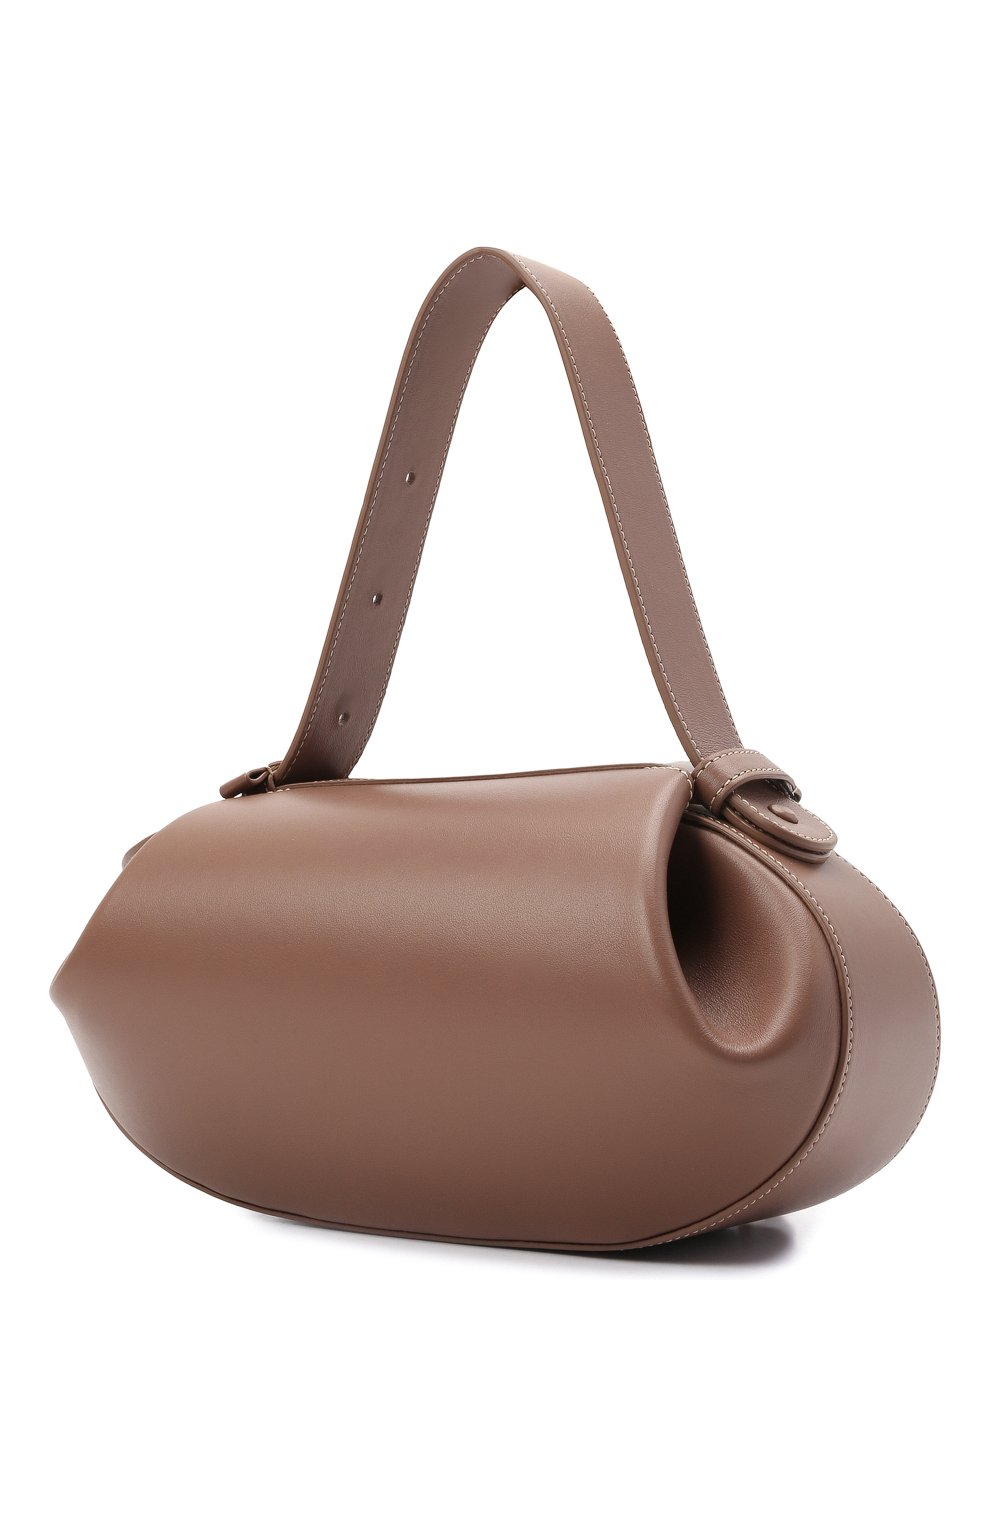 Женская сумка loaf YUZEFI бежевого цвета, арт. YUZPF21-HB-L0-14 | Фото 3 (Сумки-технические: Сумки top-handle; Размер: medium; Материал: Натуральная кожа; Ремень/цепочка: На ремешке)